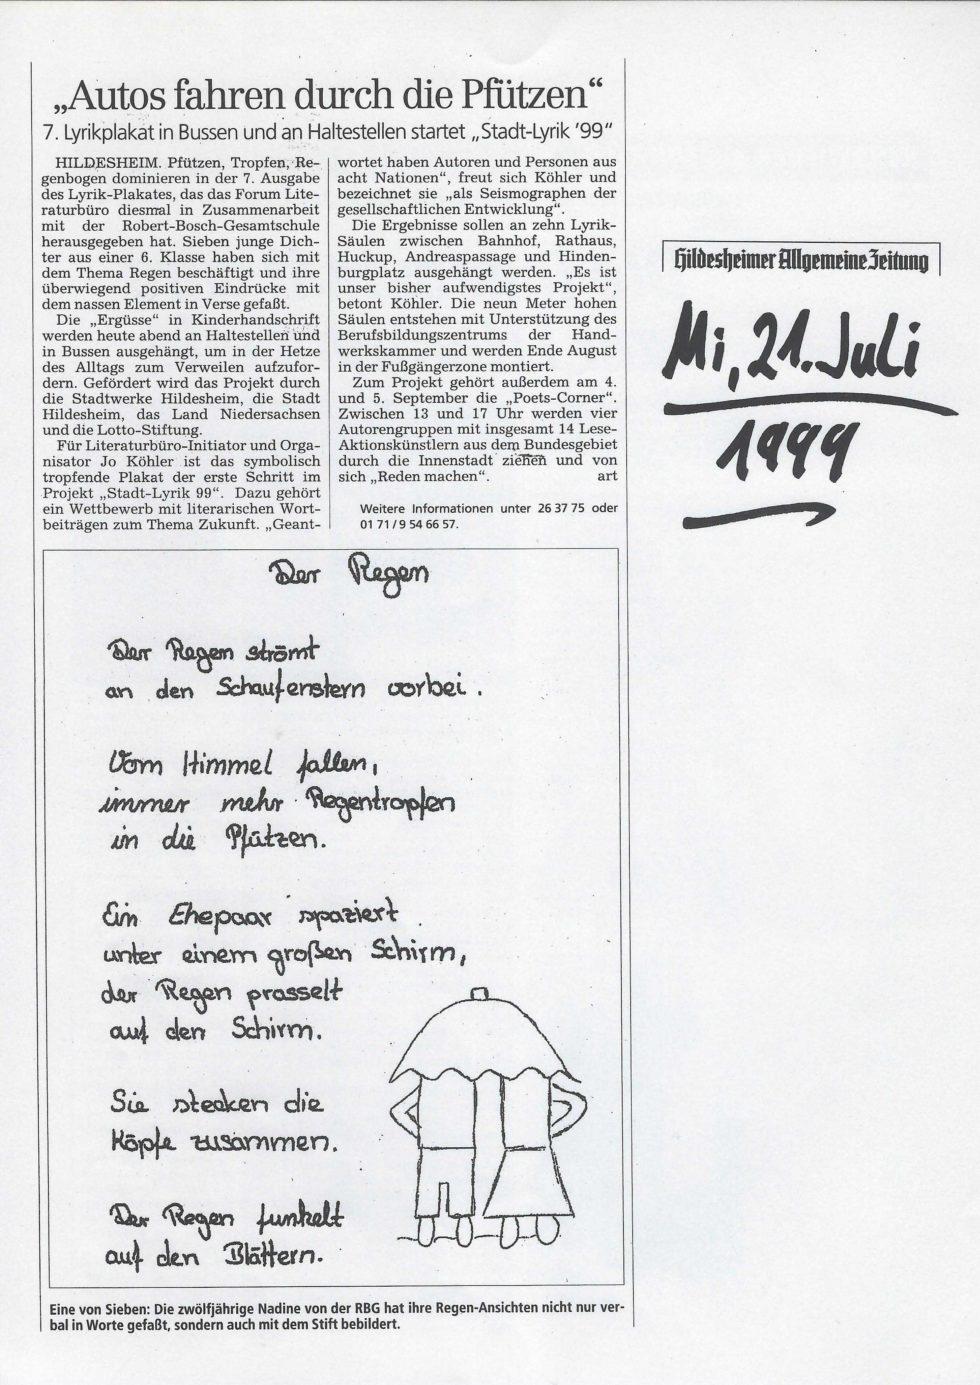 1999 Lyrik-Säulen, JVA Lesung,_Seite_22